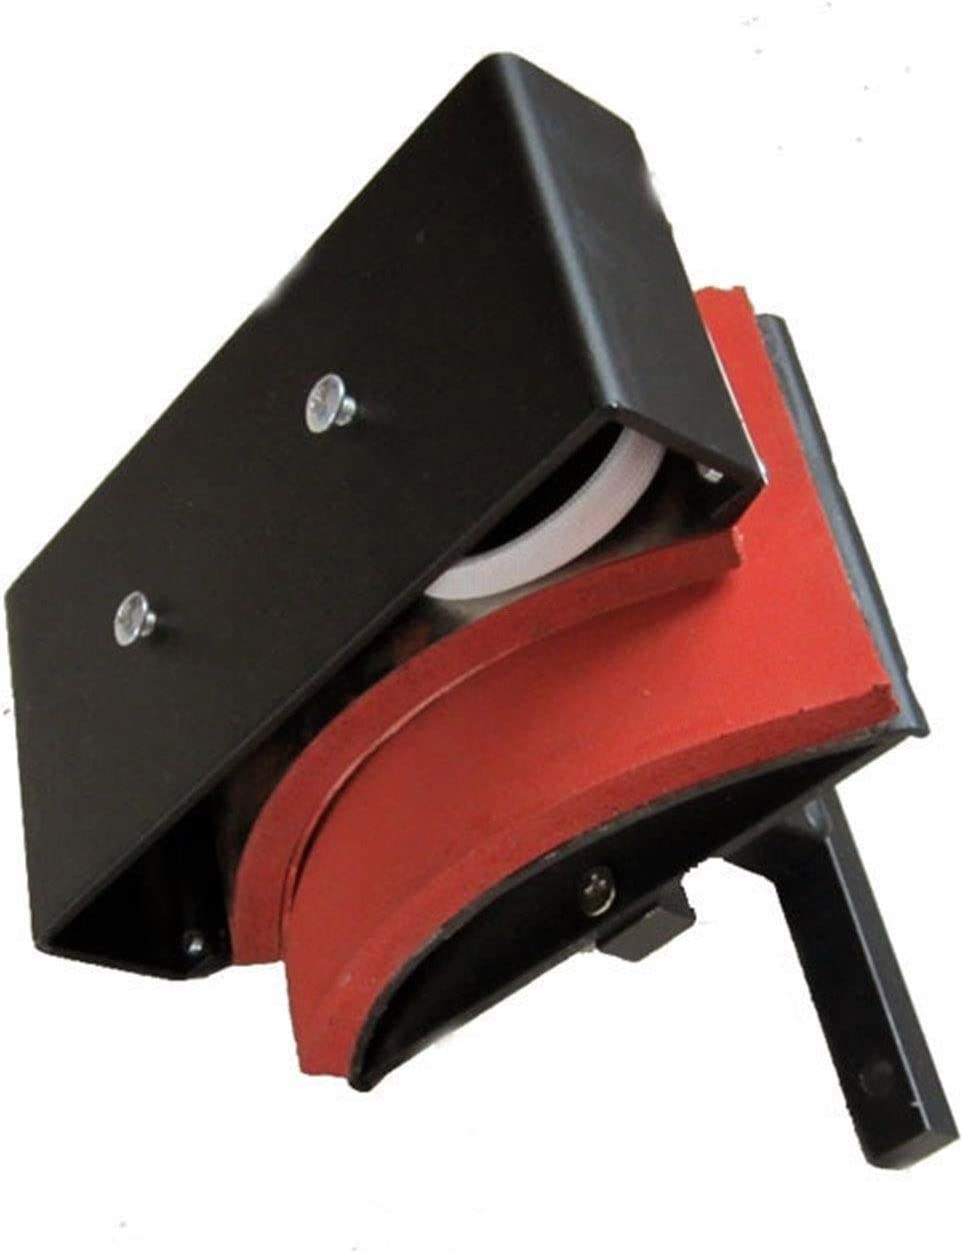 New Printer Accessories Wtsfwf Sublimation Silicone Heater Cap Mold Heat Press Machine Cap Hat Pad/Mat 110V/220V 50HZ (Color : 110V) (Color : 110V)